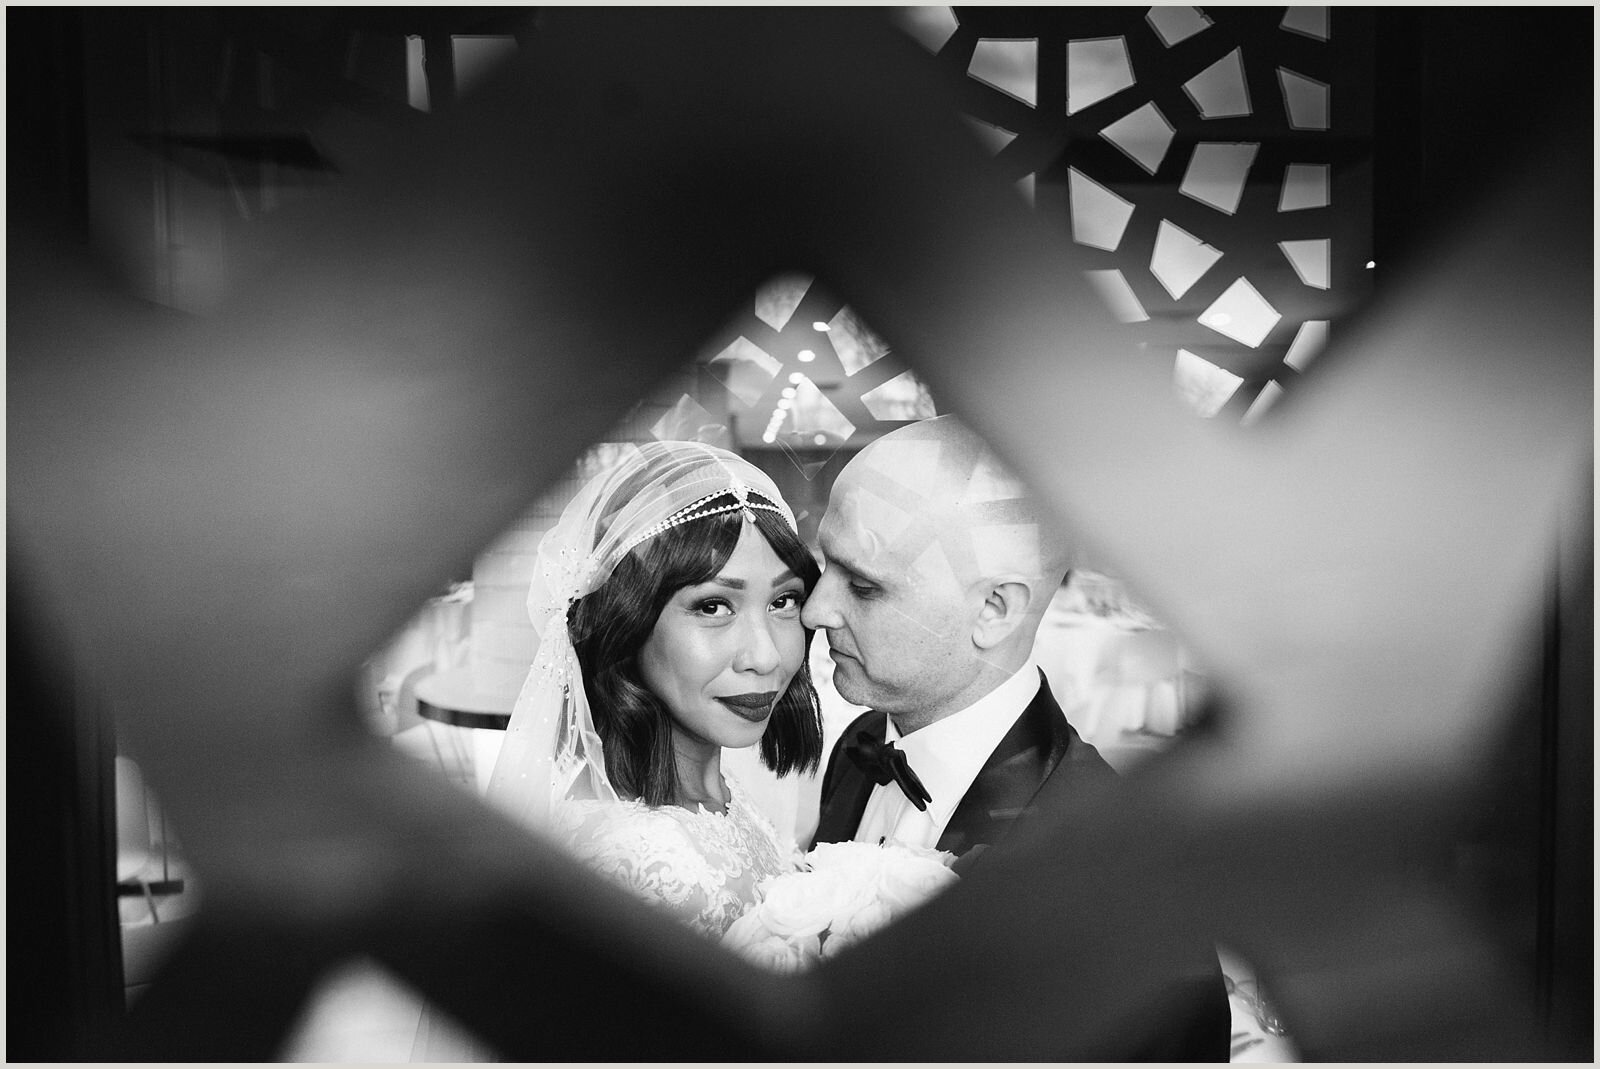 joseph_koprek_wedding_melbourne_the_prince_deck_0042.jpg